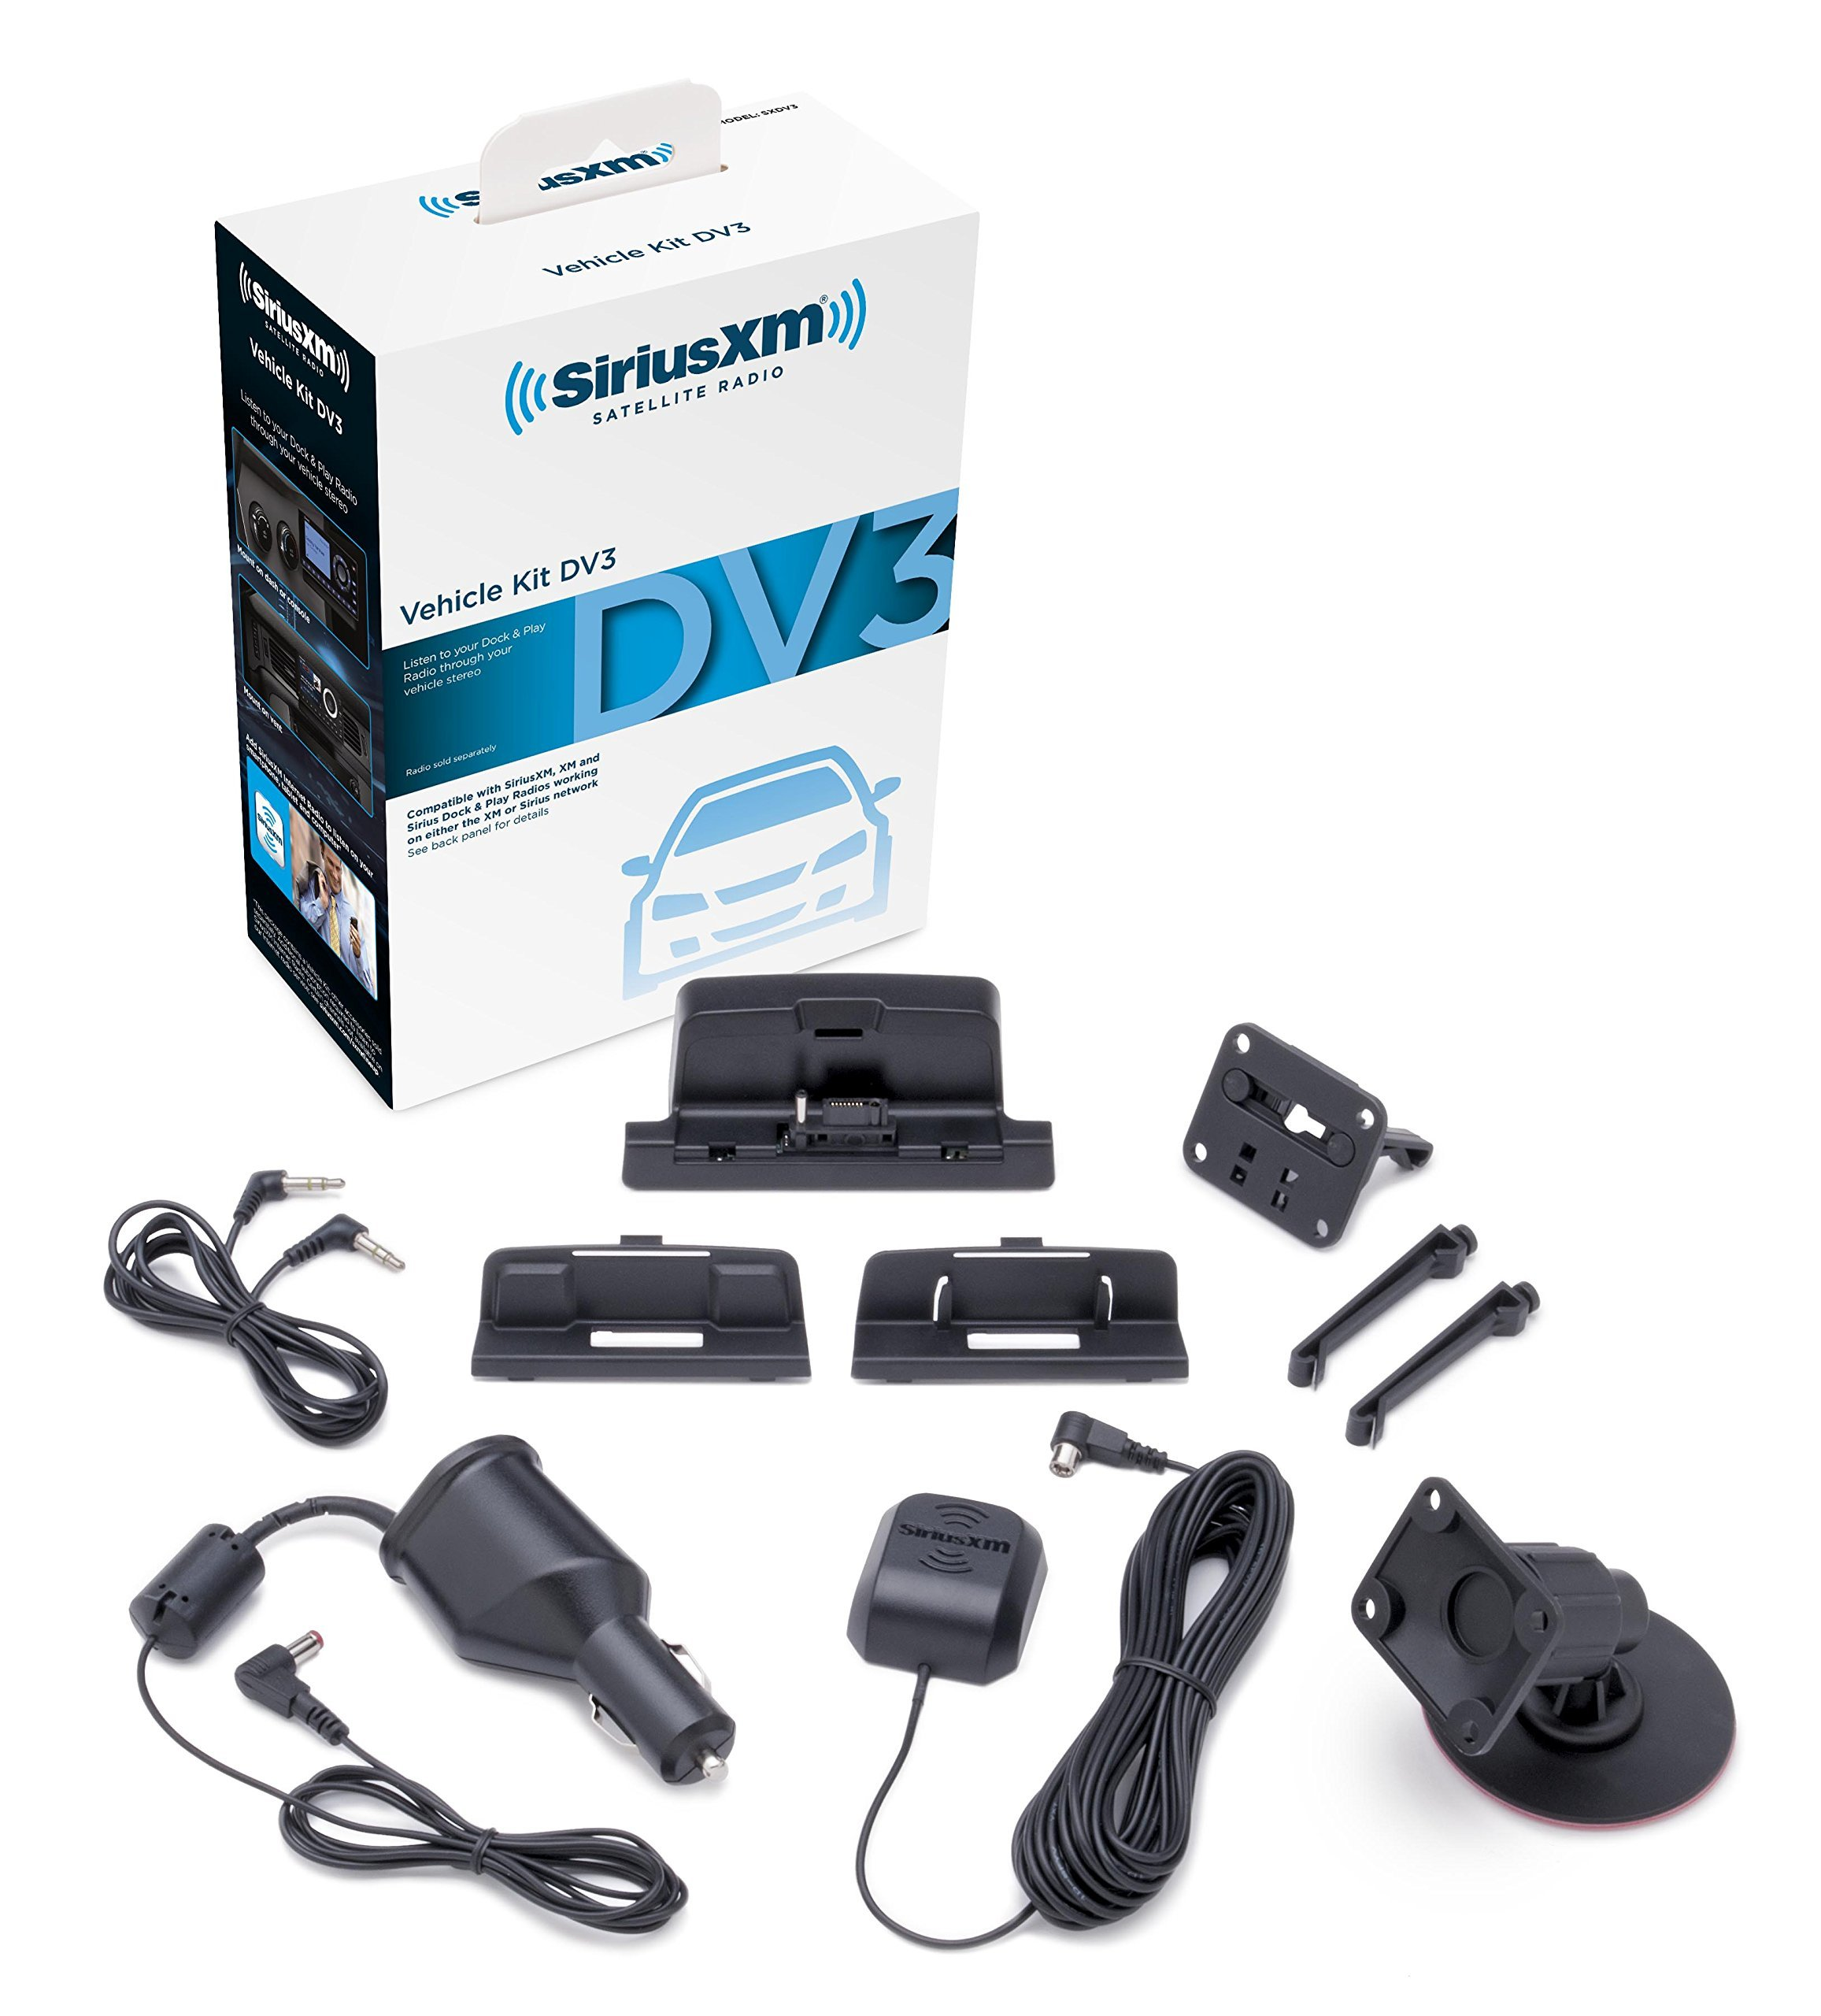 SiriusXM SXDV3 Satellite Radio Vehicle Mounting Kit with Dock and Charging Cable (Black) (Renewed)